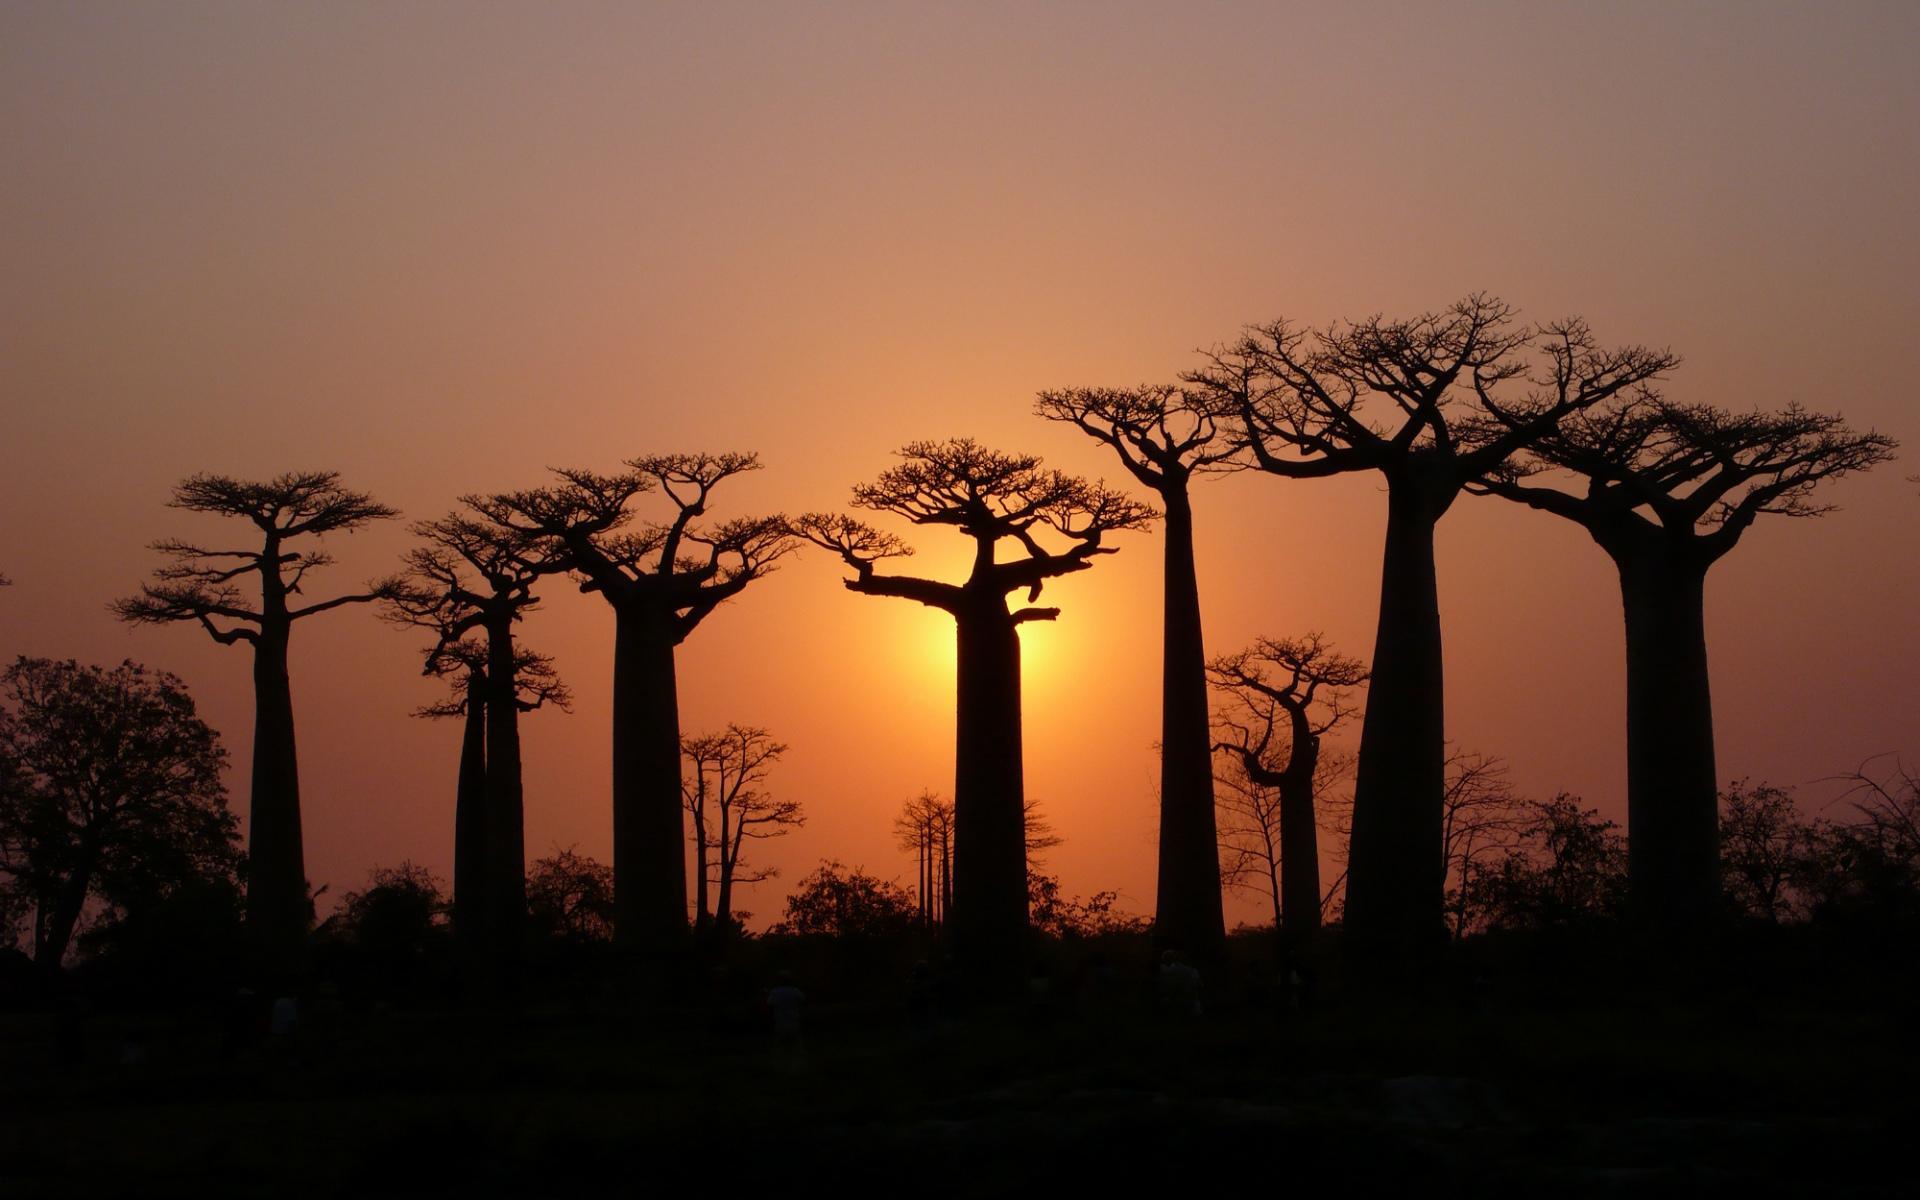 Baobab Tree wallpapers HD quality